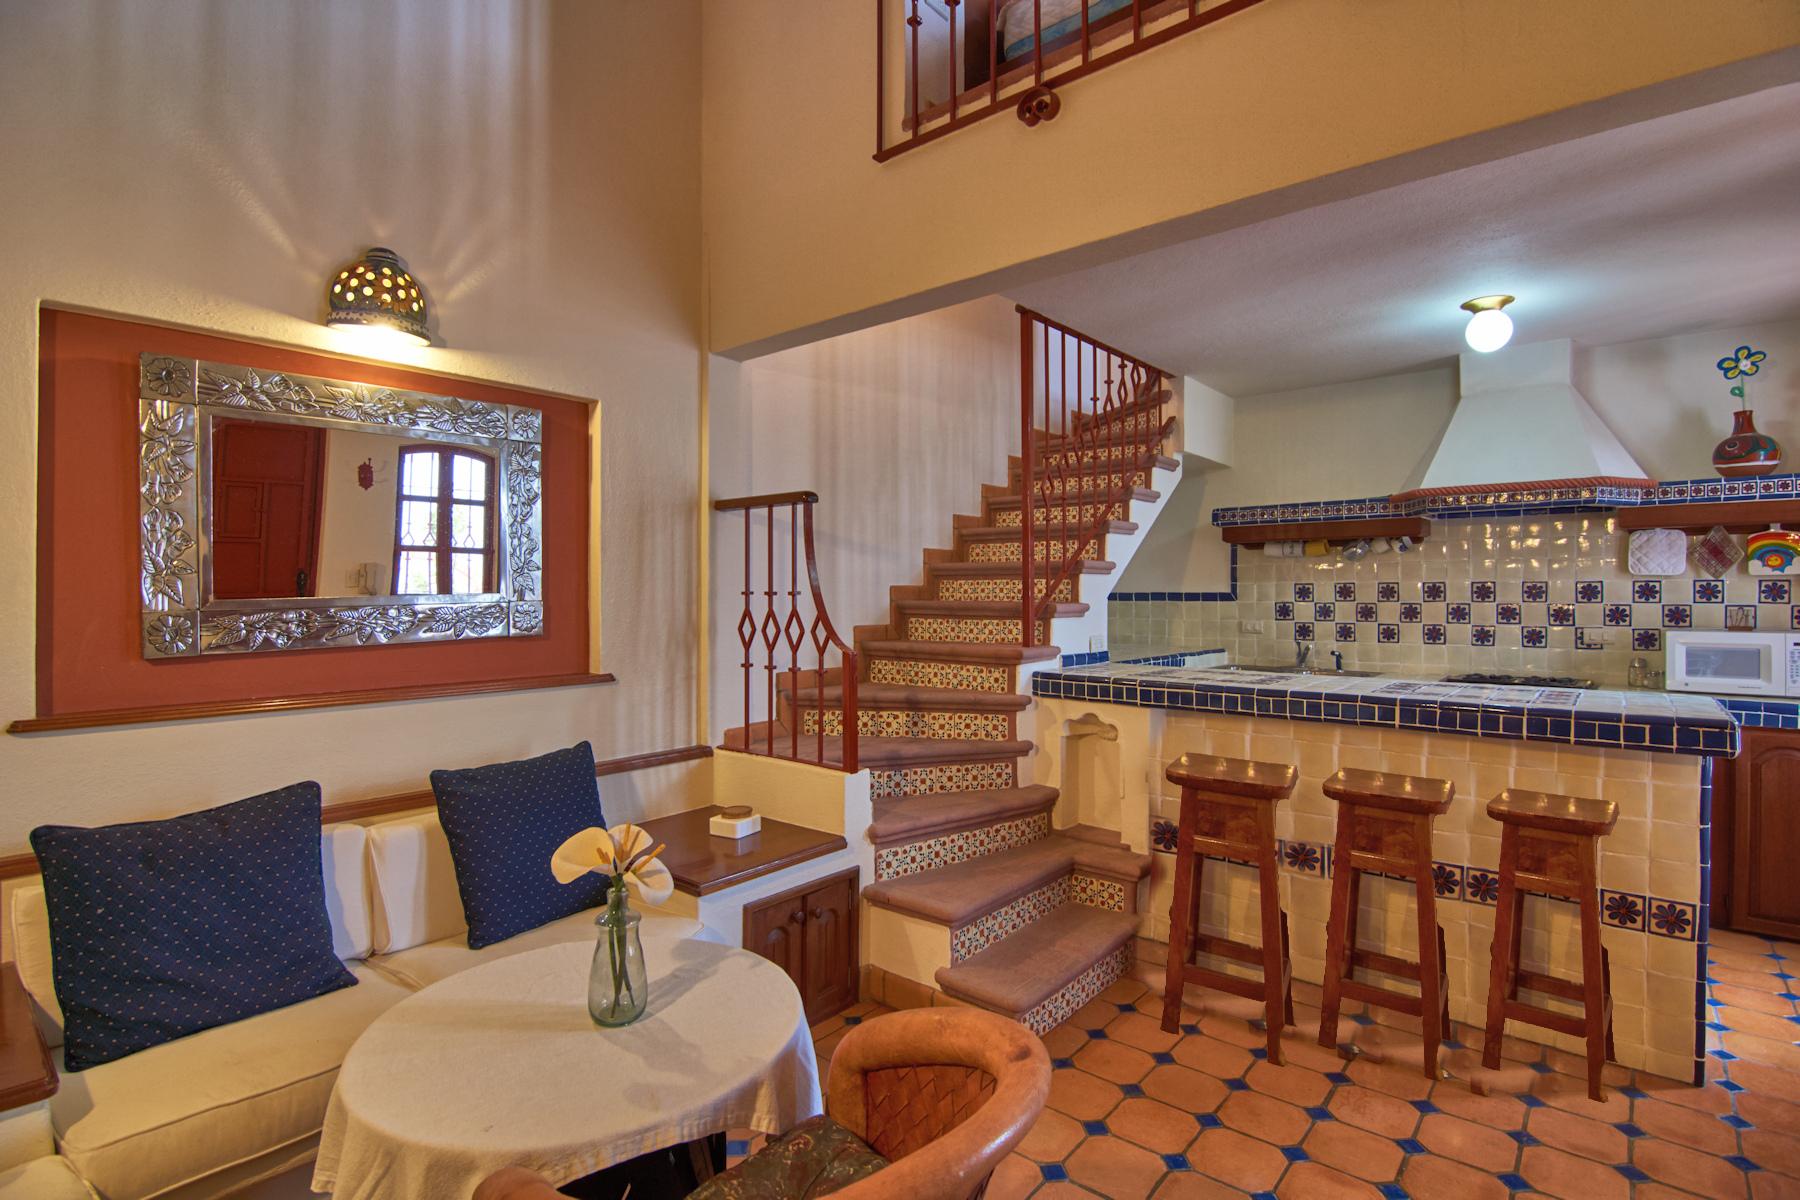 Additional photo for property listing at Casa Bovedas Centro, San Miguel De Allende, Guanajuato Mexico